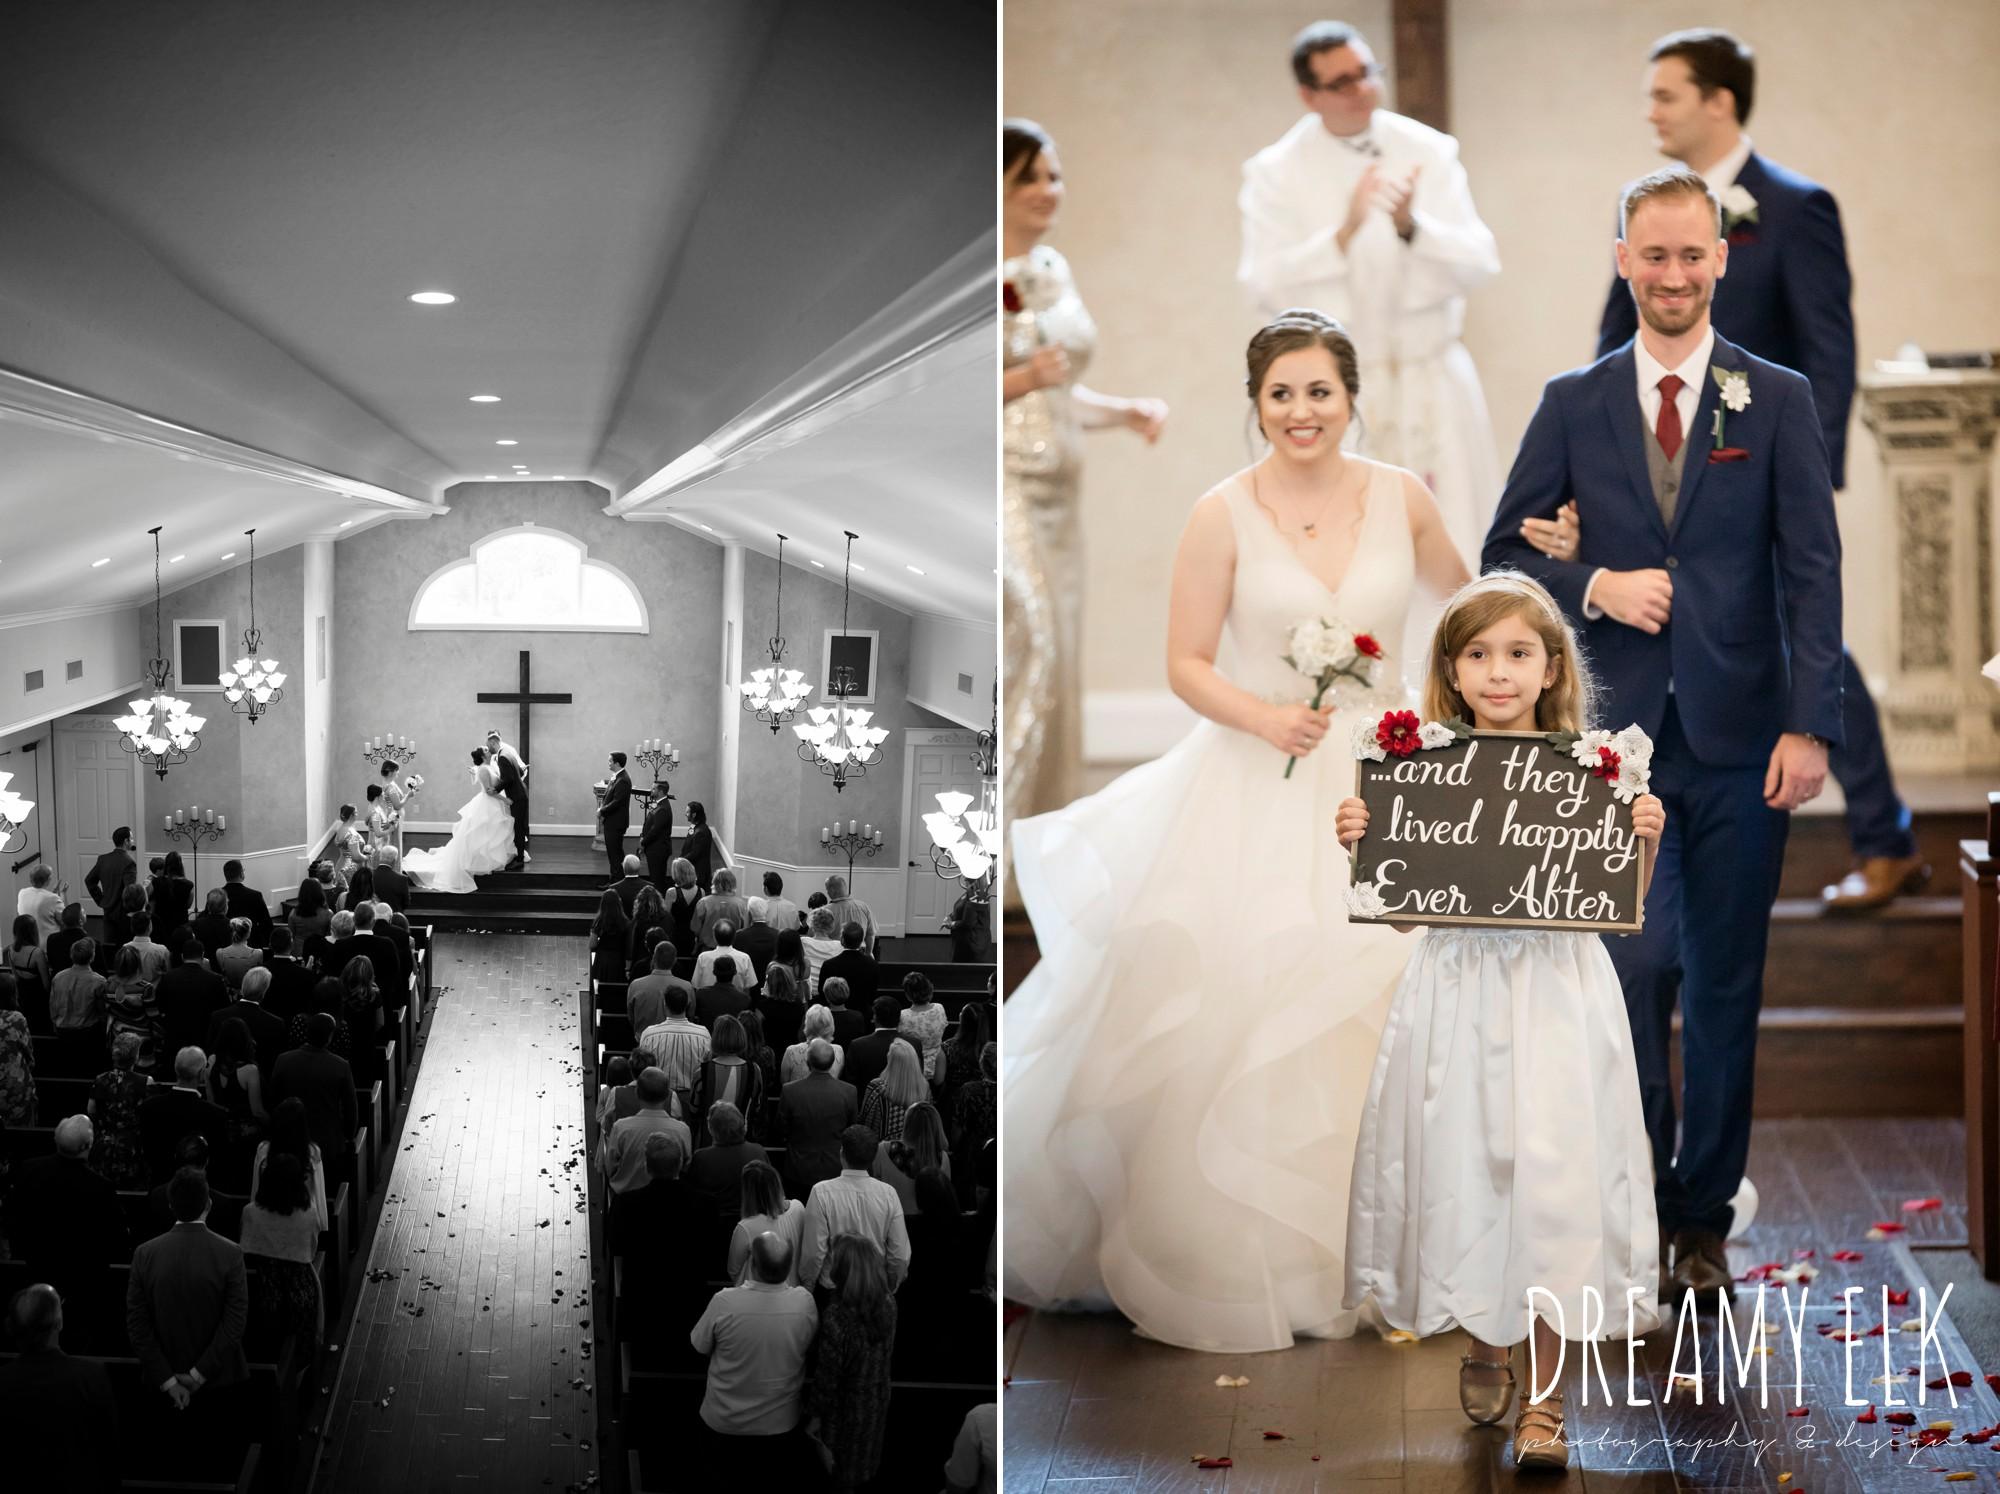 fall wedding, gold and navy wedding photo, ashelynn manor, austin texas wedding photographer, dreamy elk photography and design, emily ross